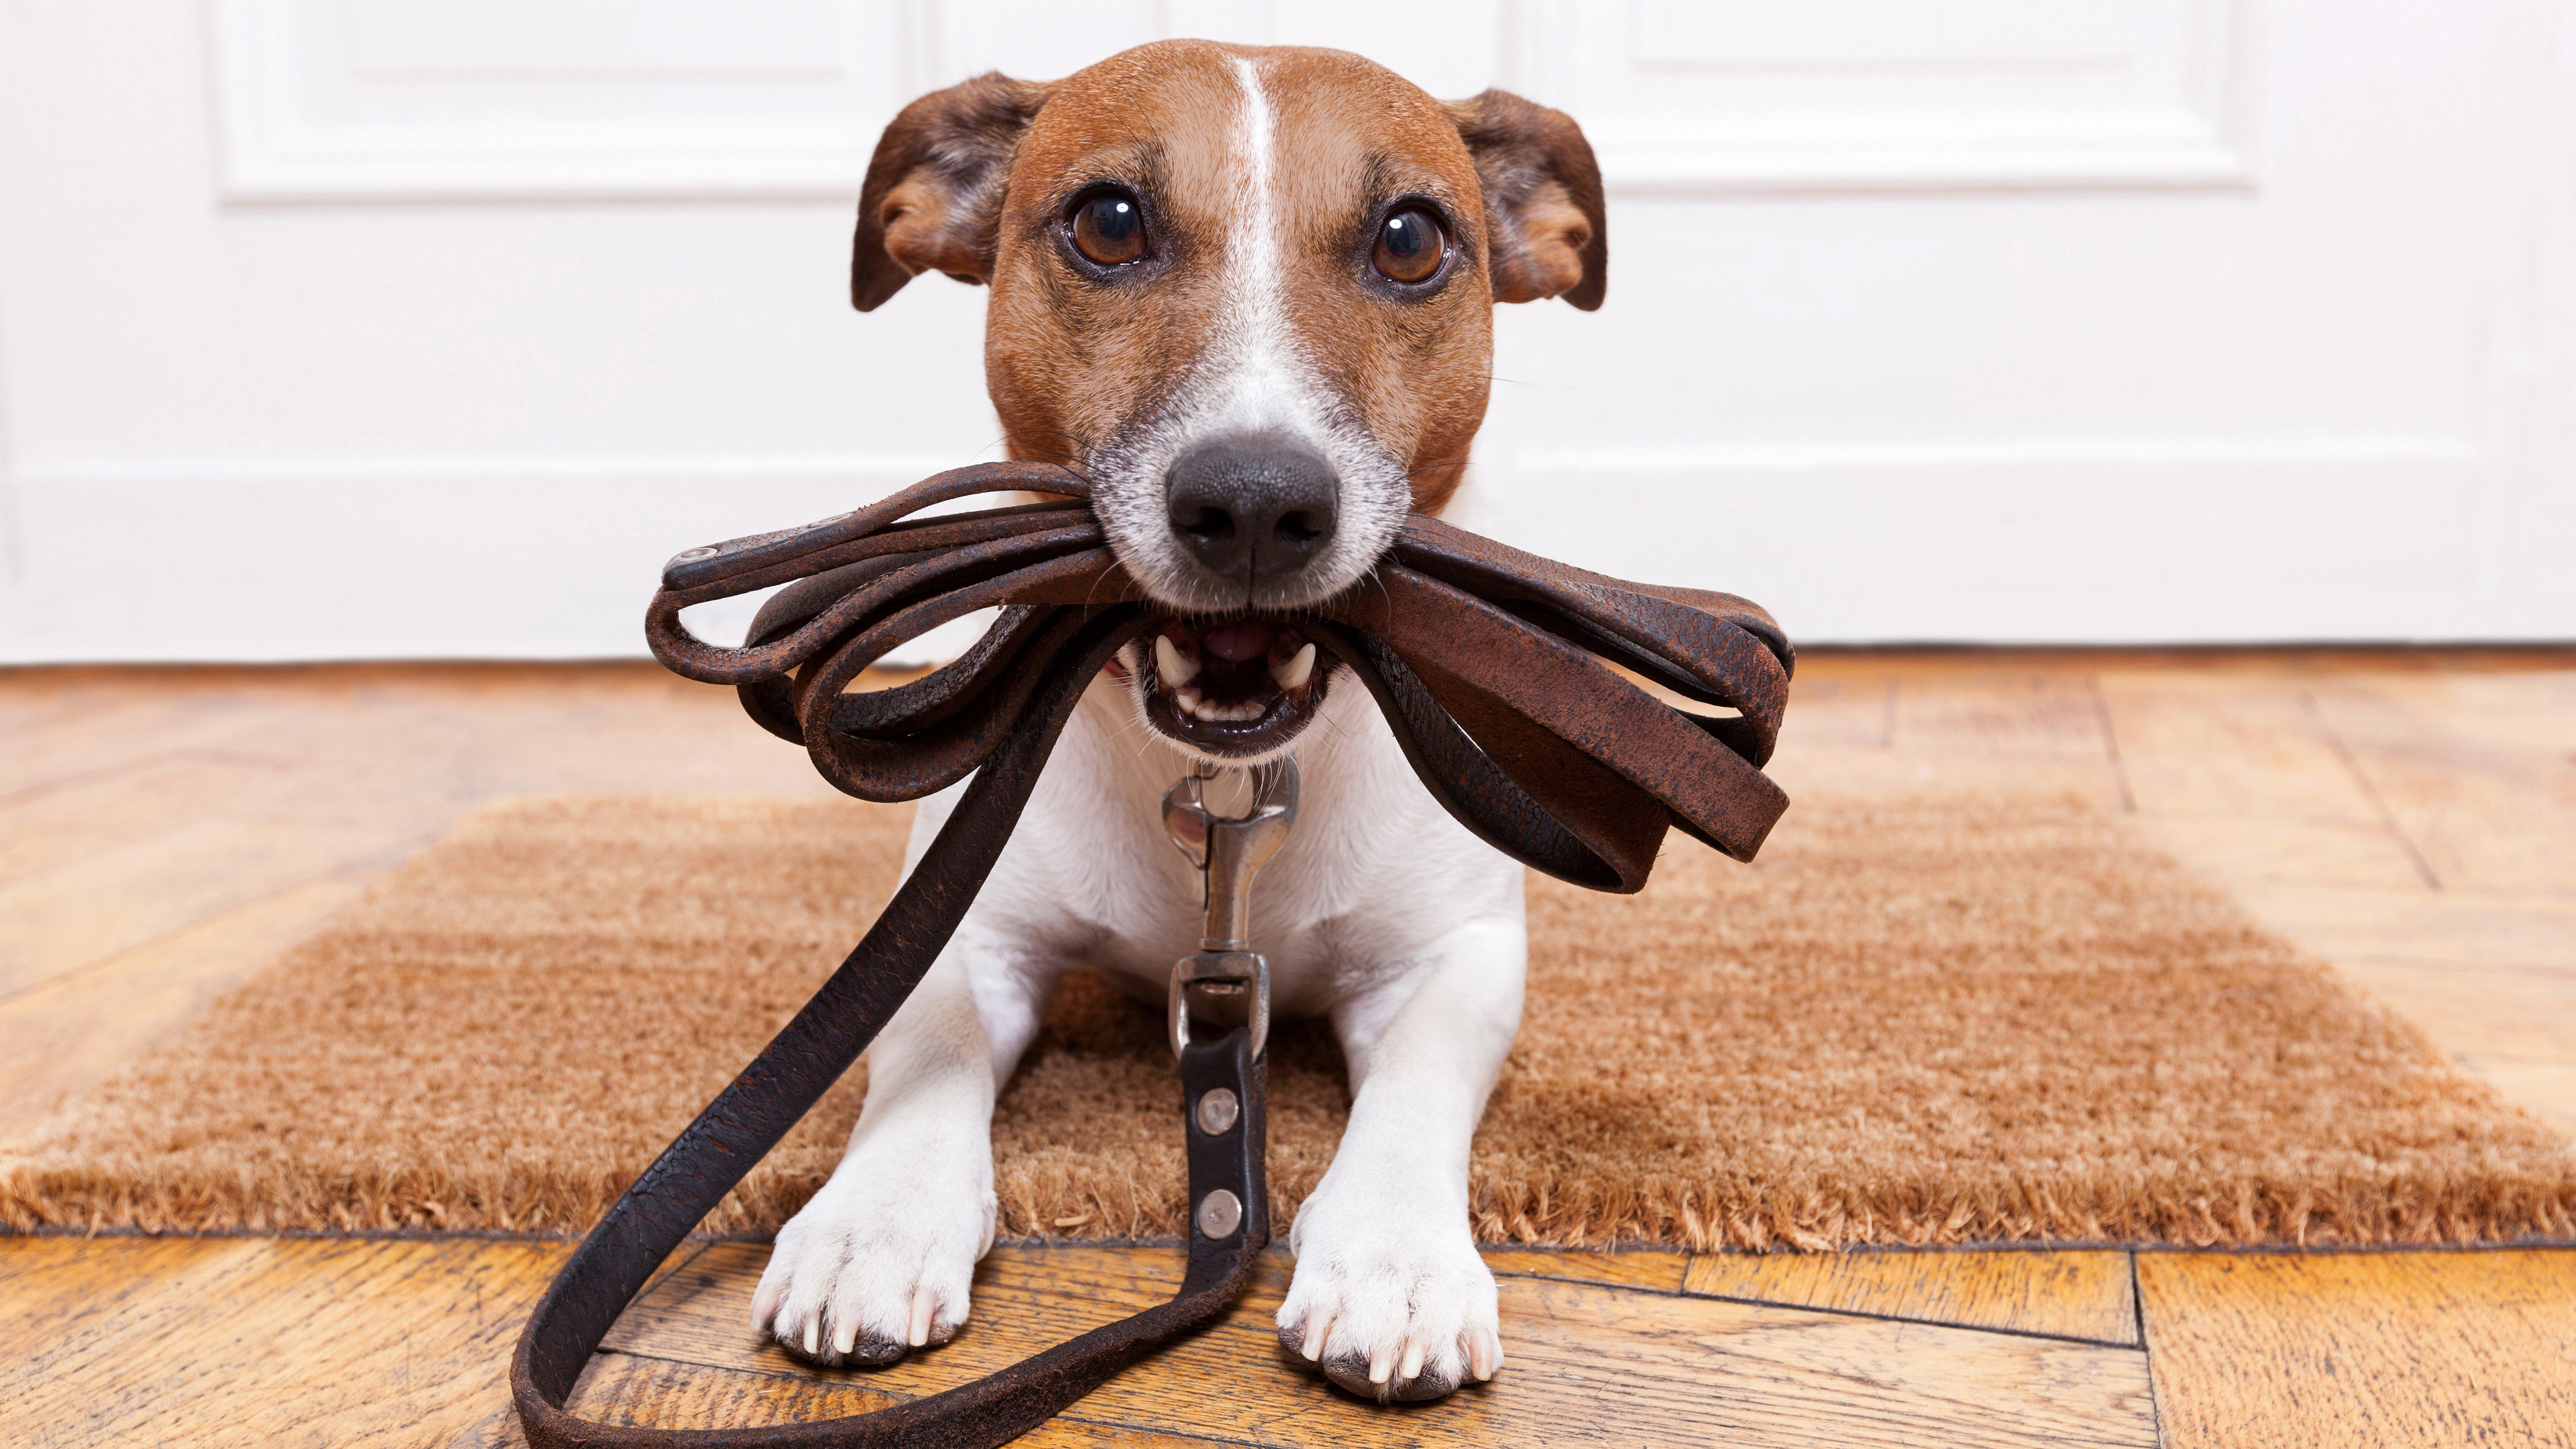 Jack Russell Terrier waiting to walk wallpaper